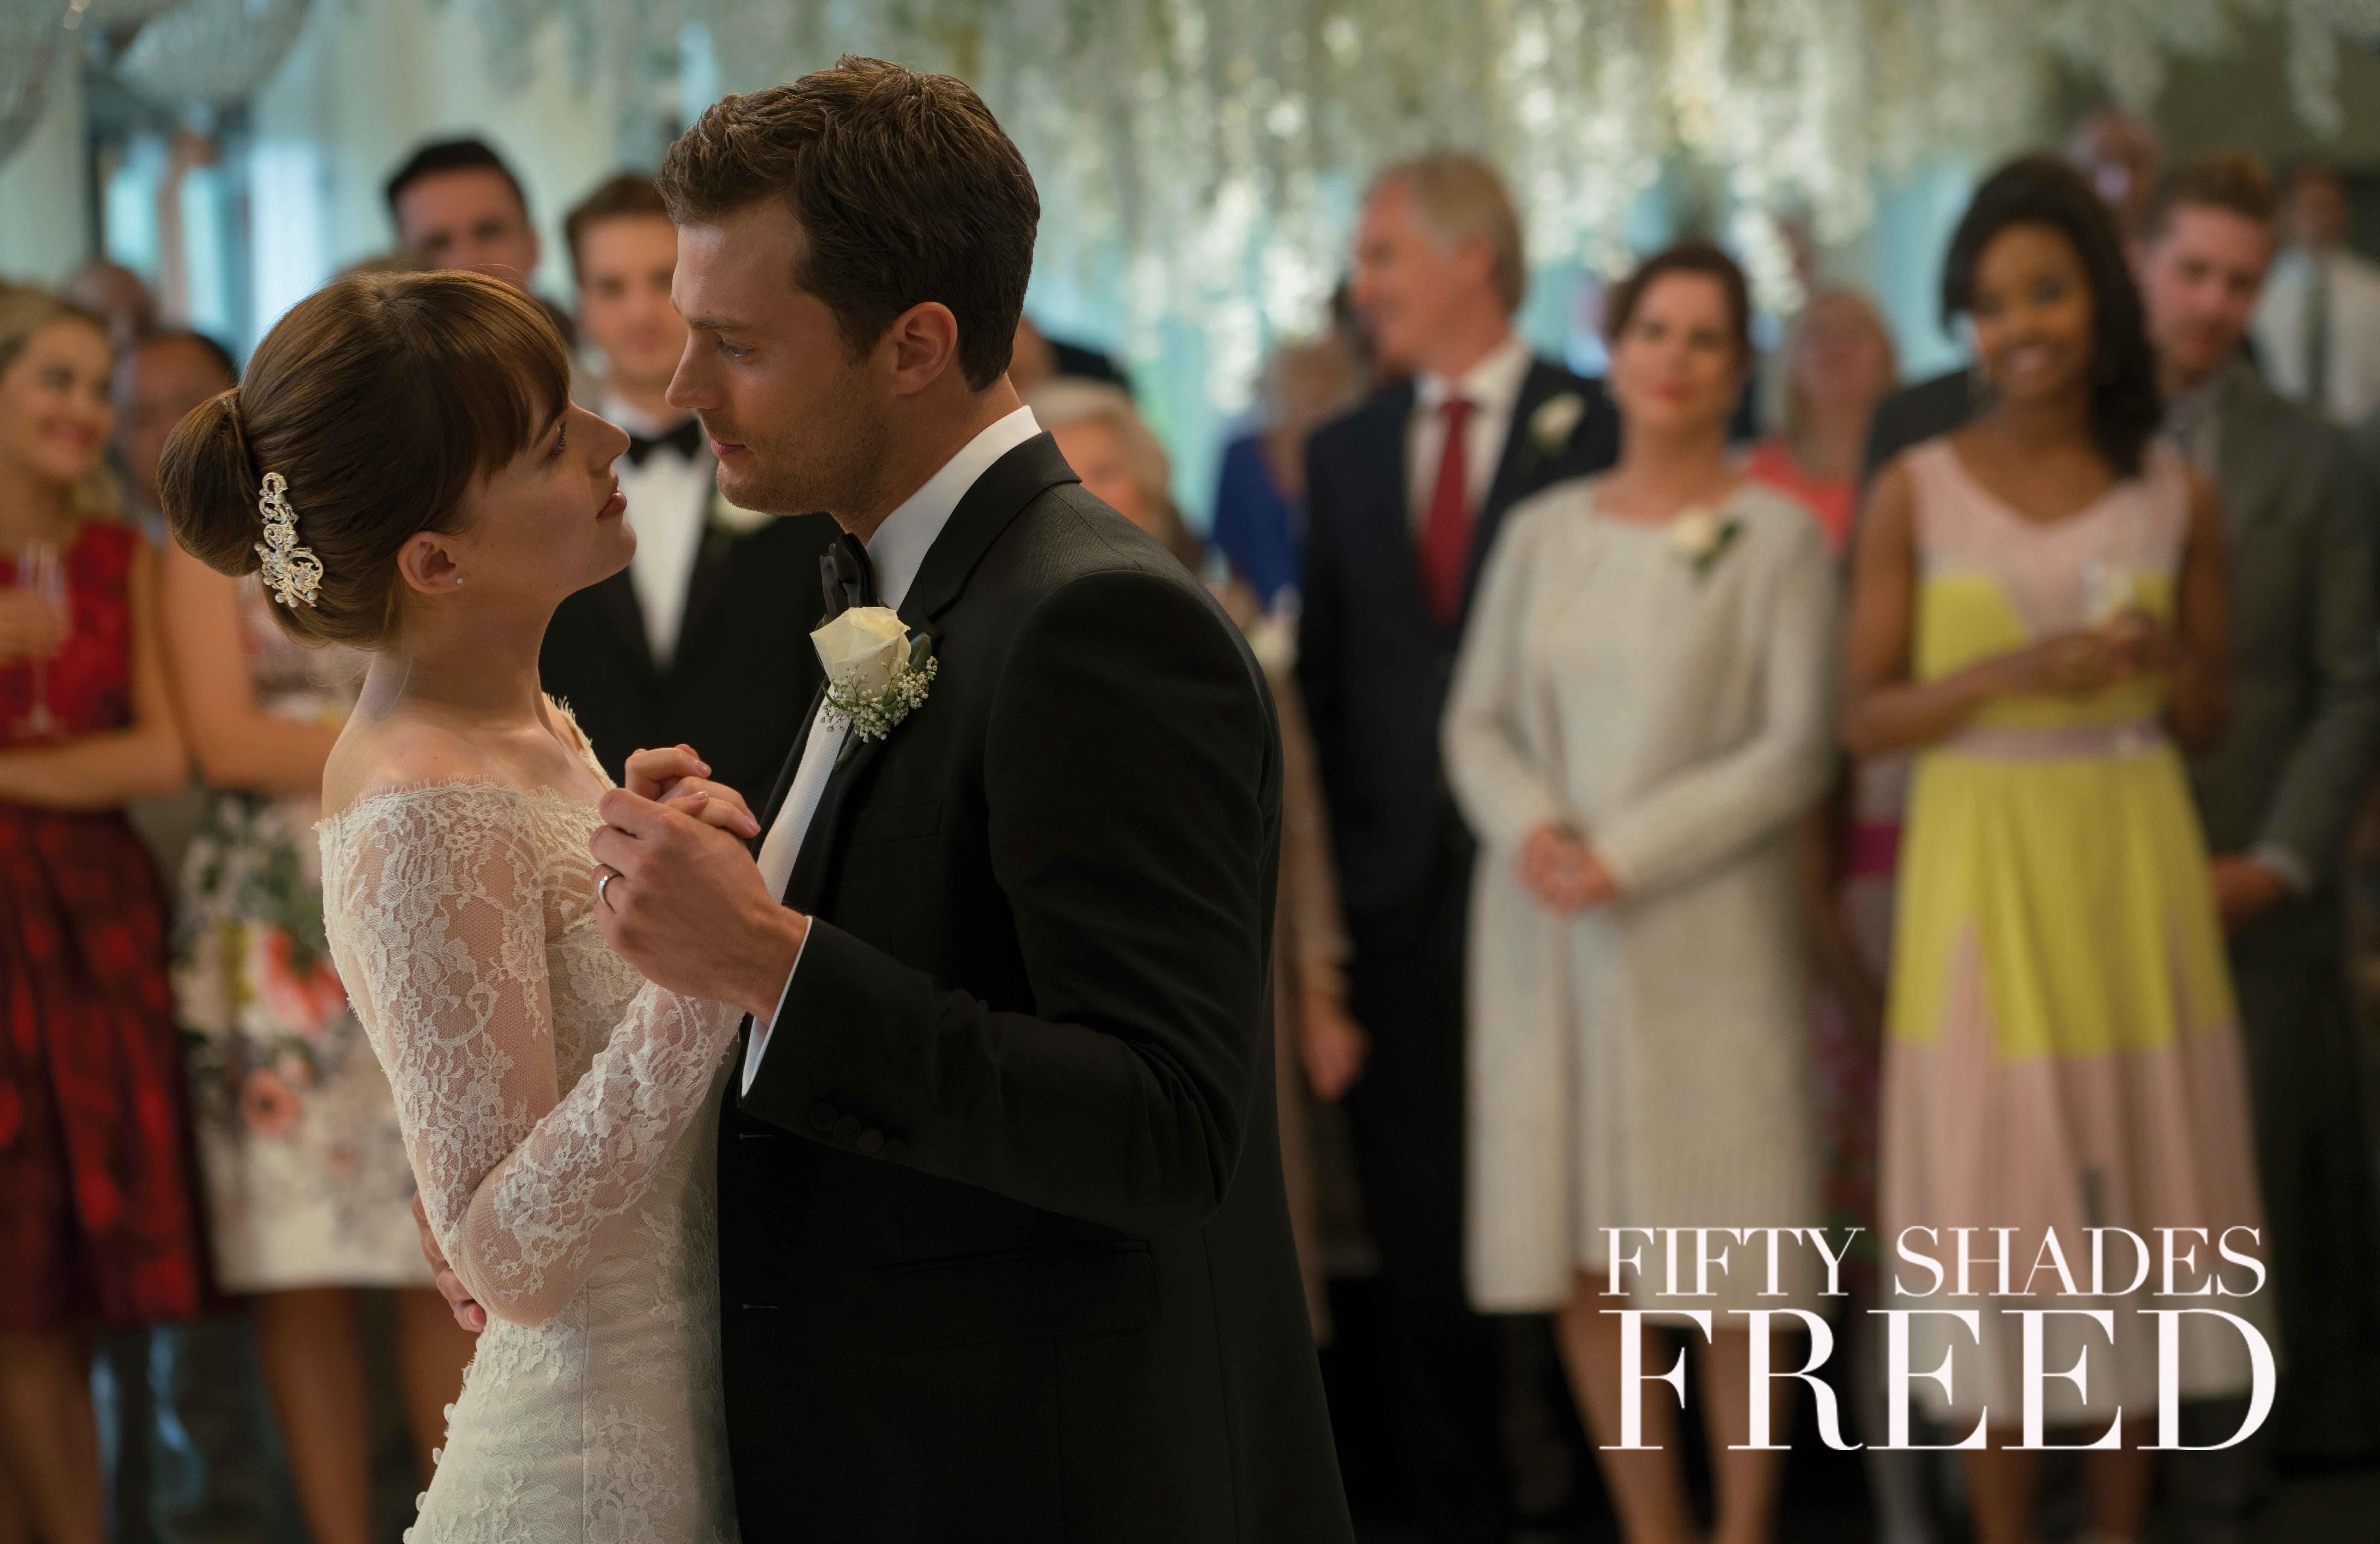 The Final Chapter Begins February 9 Fifty Shades Freed Fifty Shades Jamie Dornan Dakota Johnson [ 5160 x 7952 Pixel ]